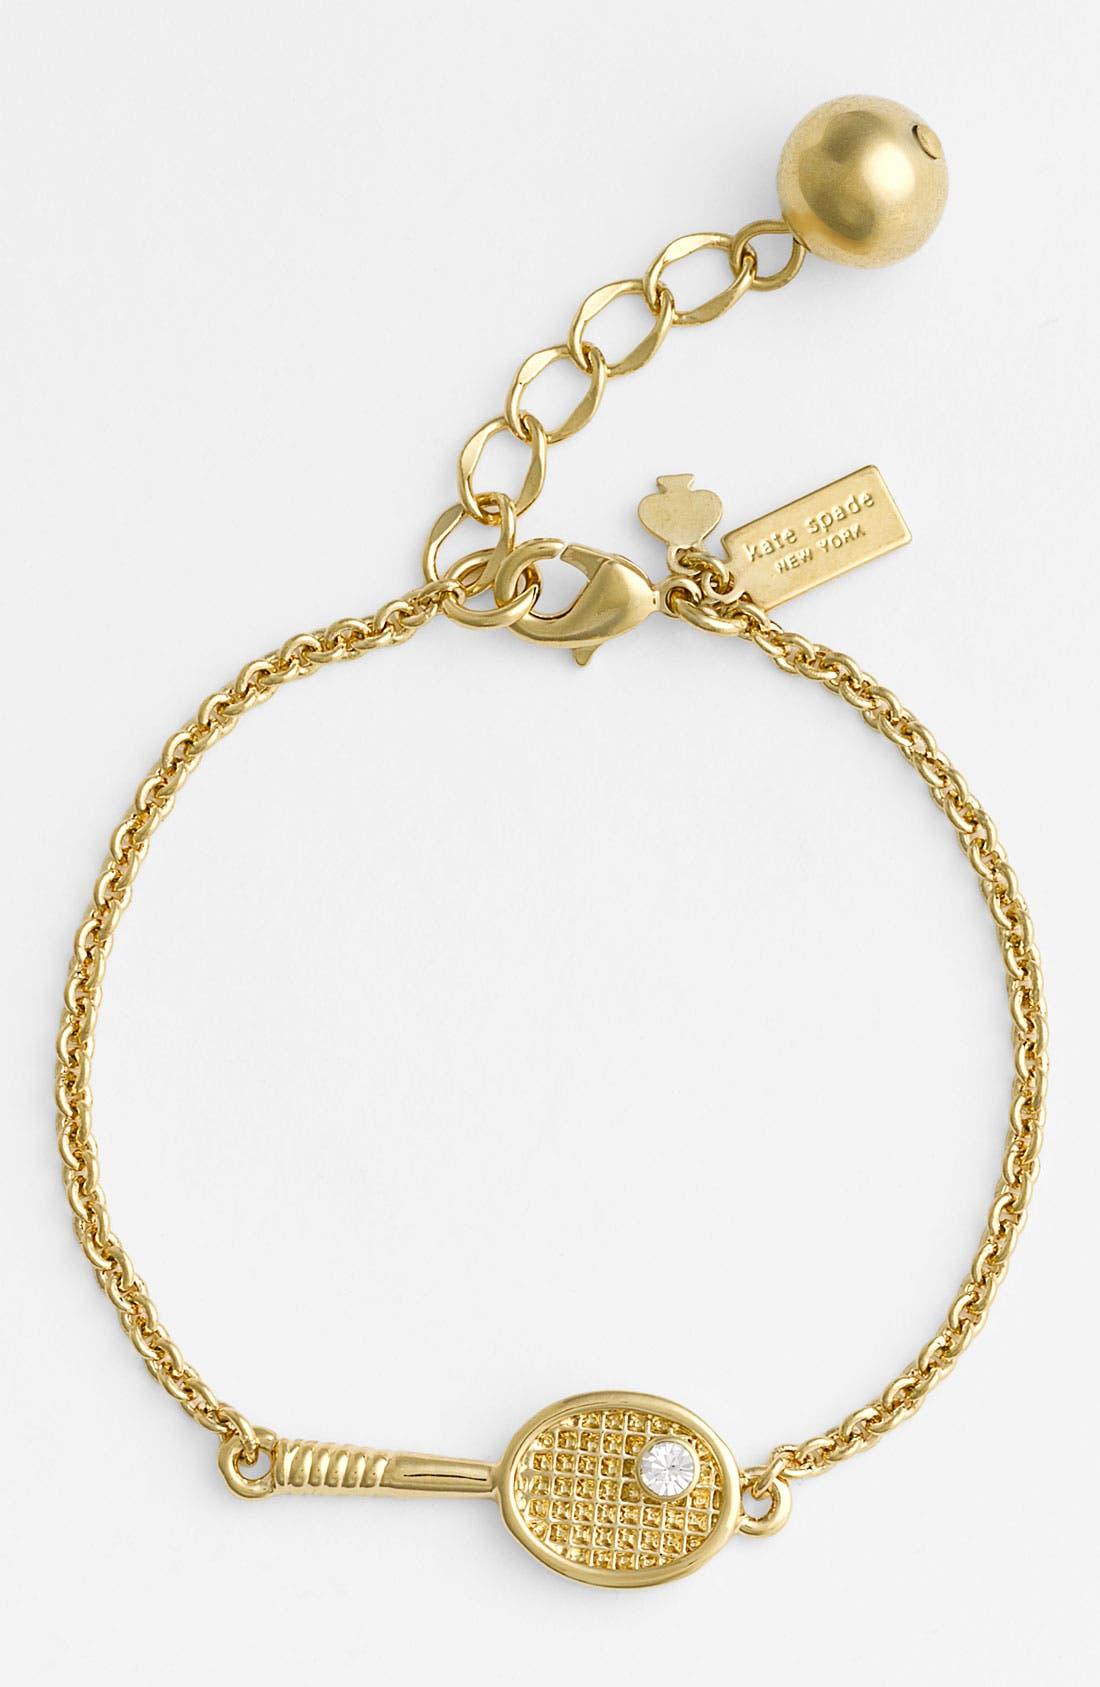 Alternate Image 1 Selected - kate spade new york 'match point' tennis bracelet